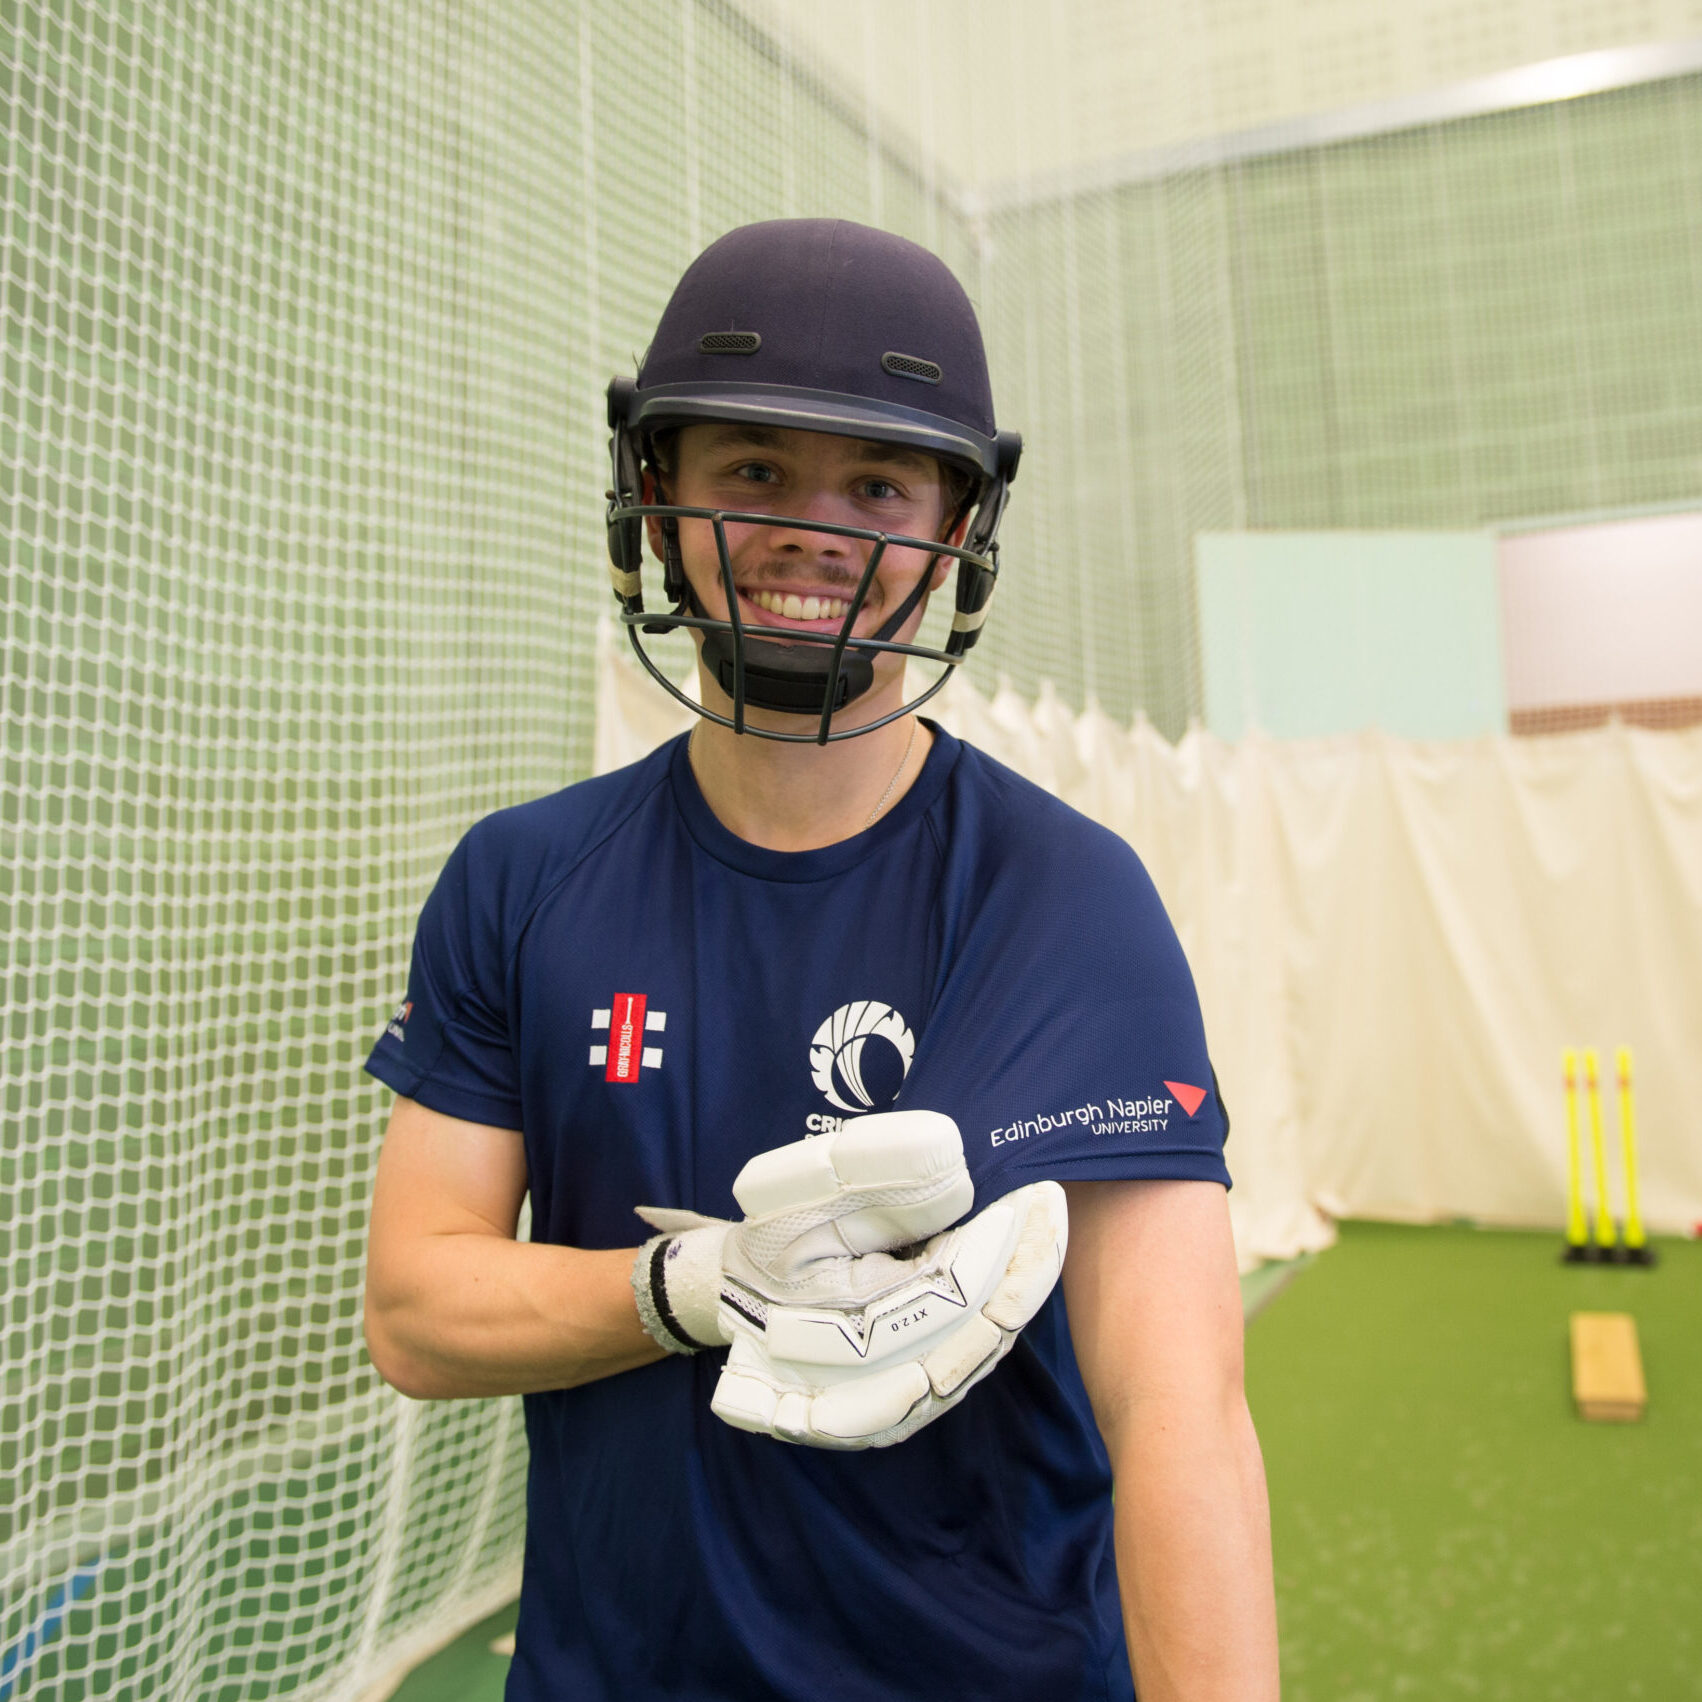 Edinburgh Napier Cricket National Performance Academy